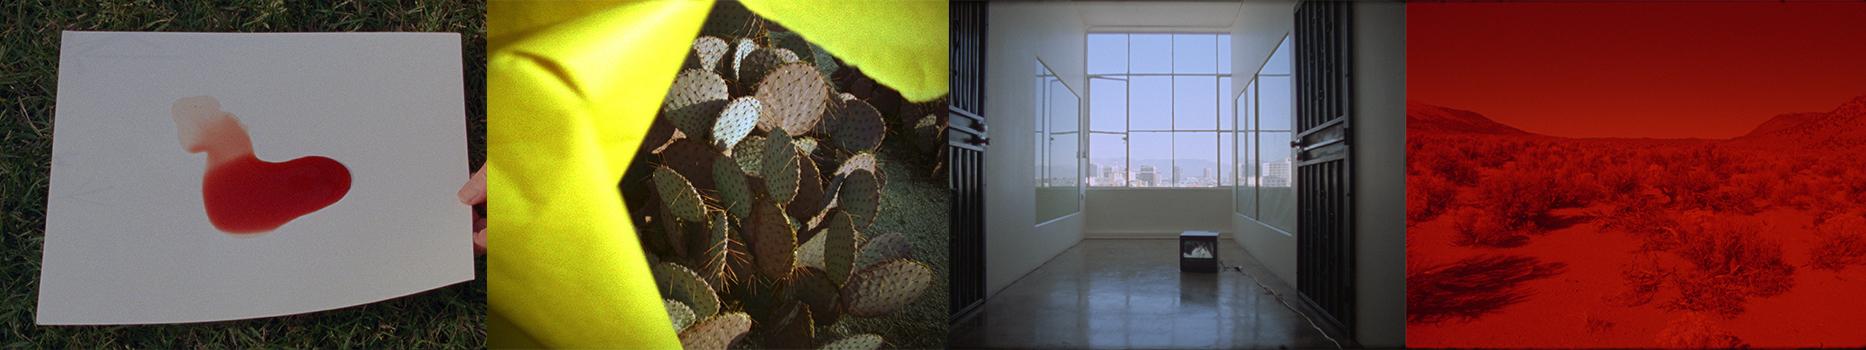 Landscape Plus with Laida Lertxundi